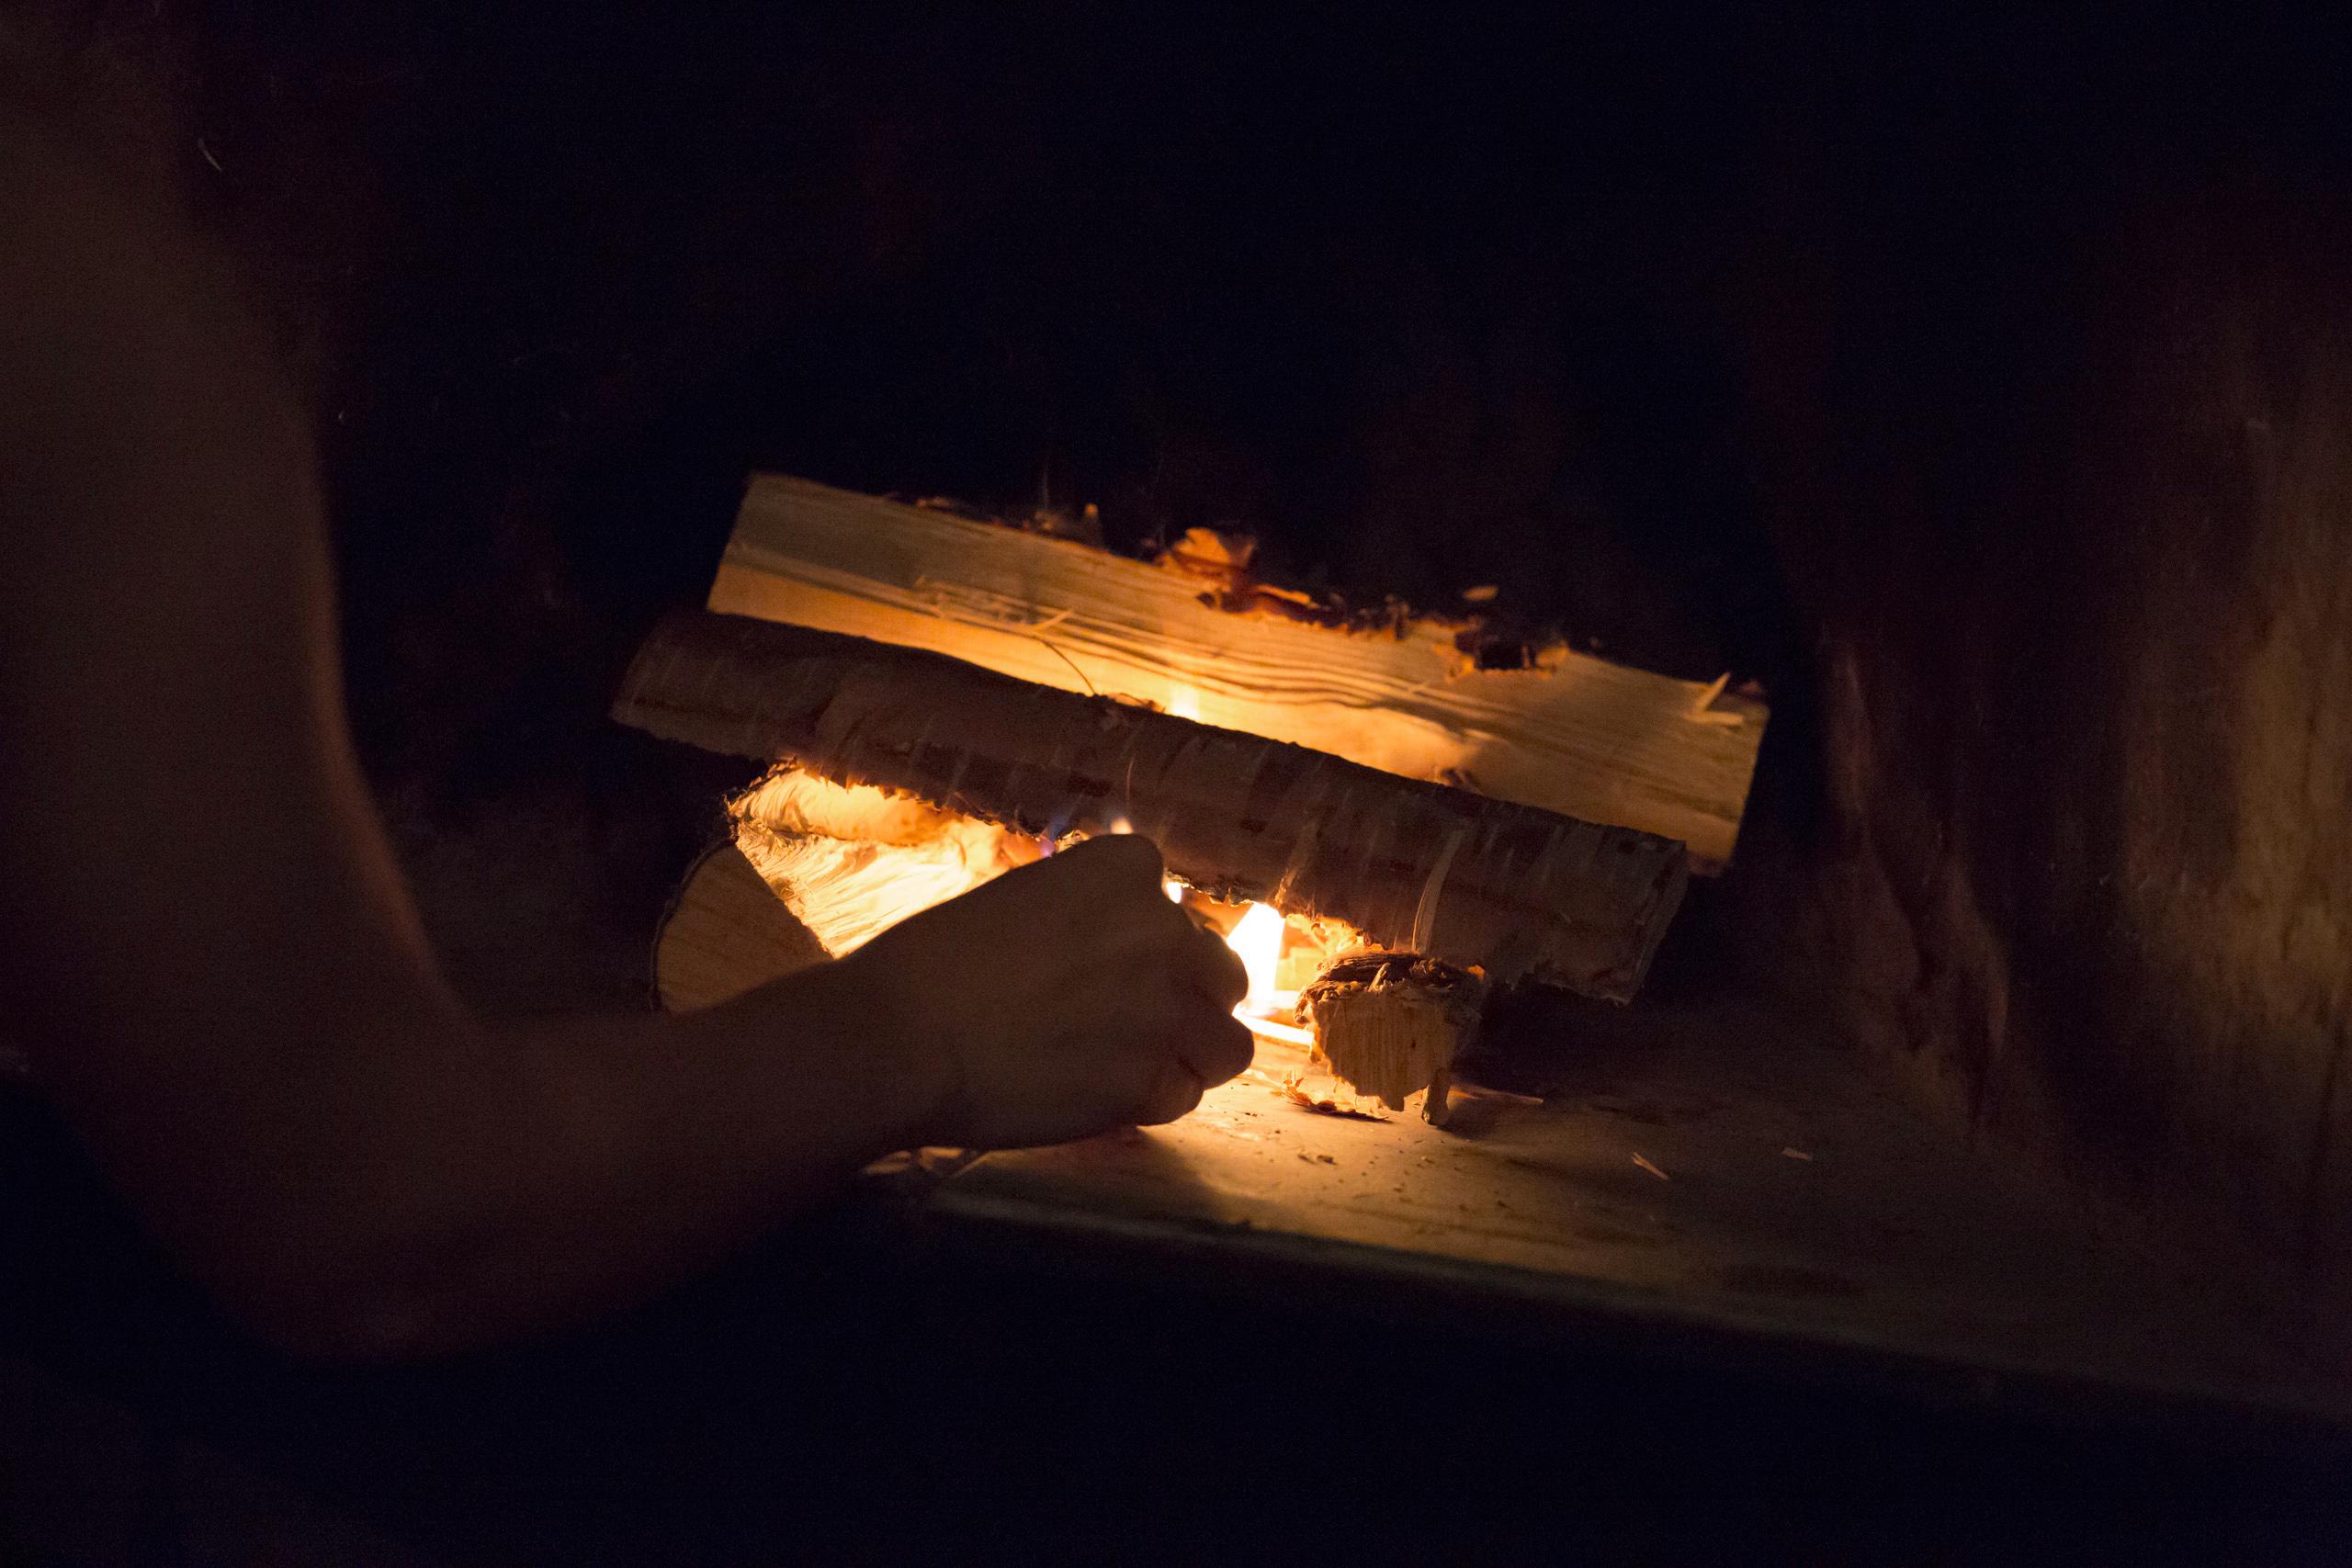 I_made_fire